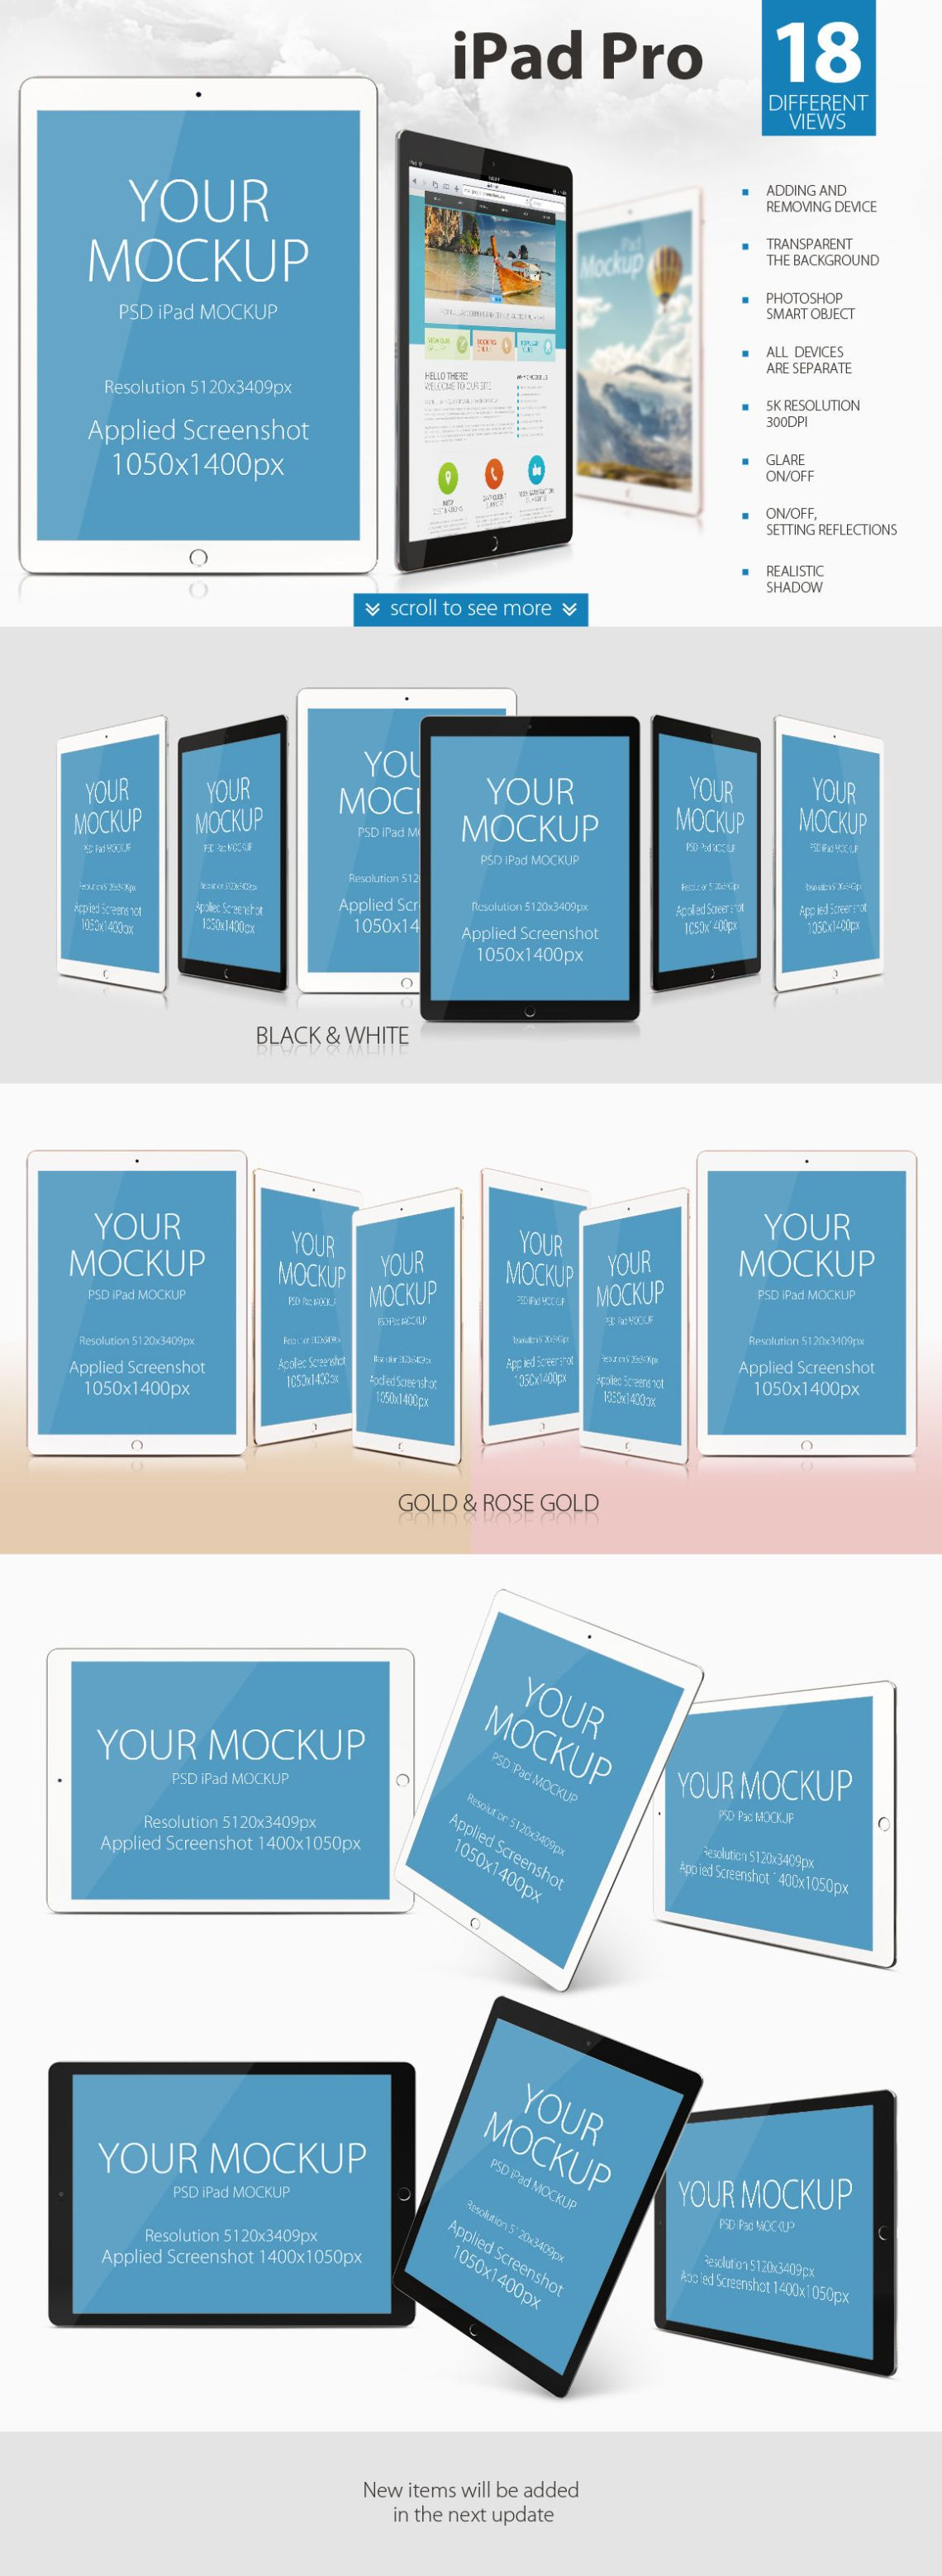 Download Macbook Air Mockup Psd Yellowimages